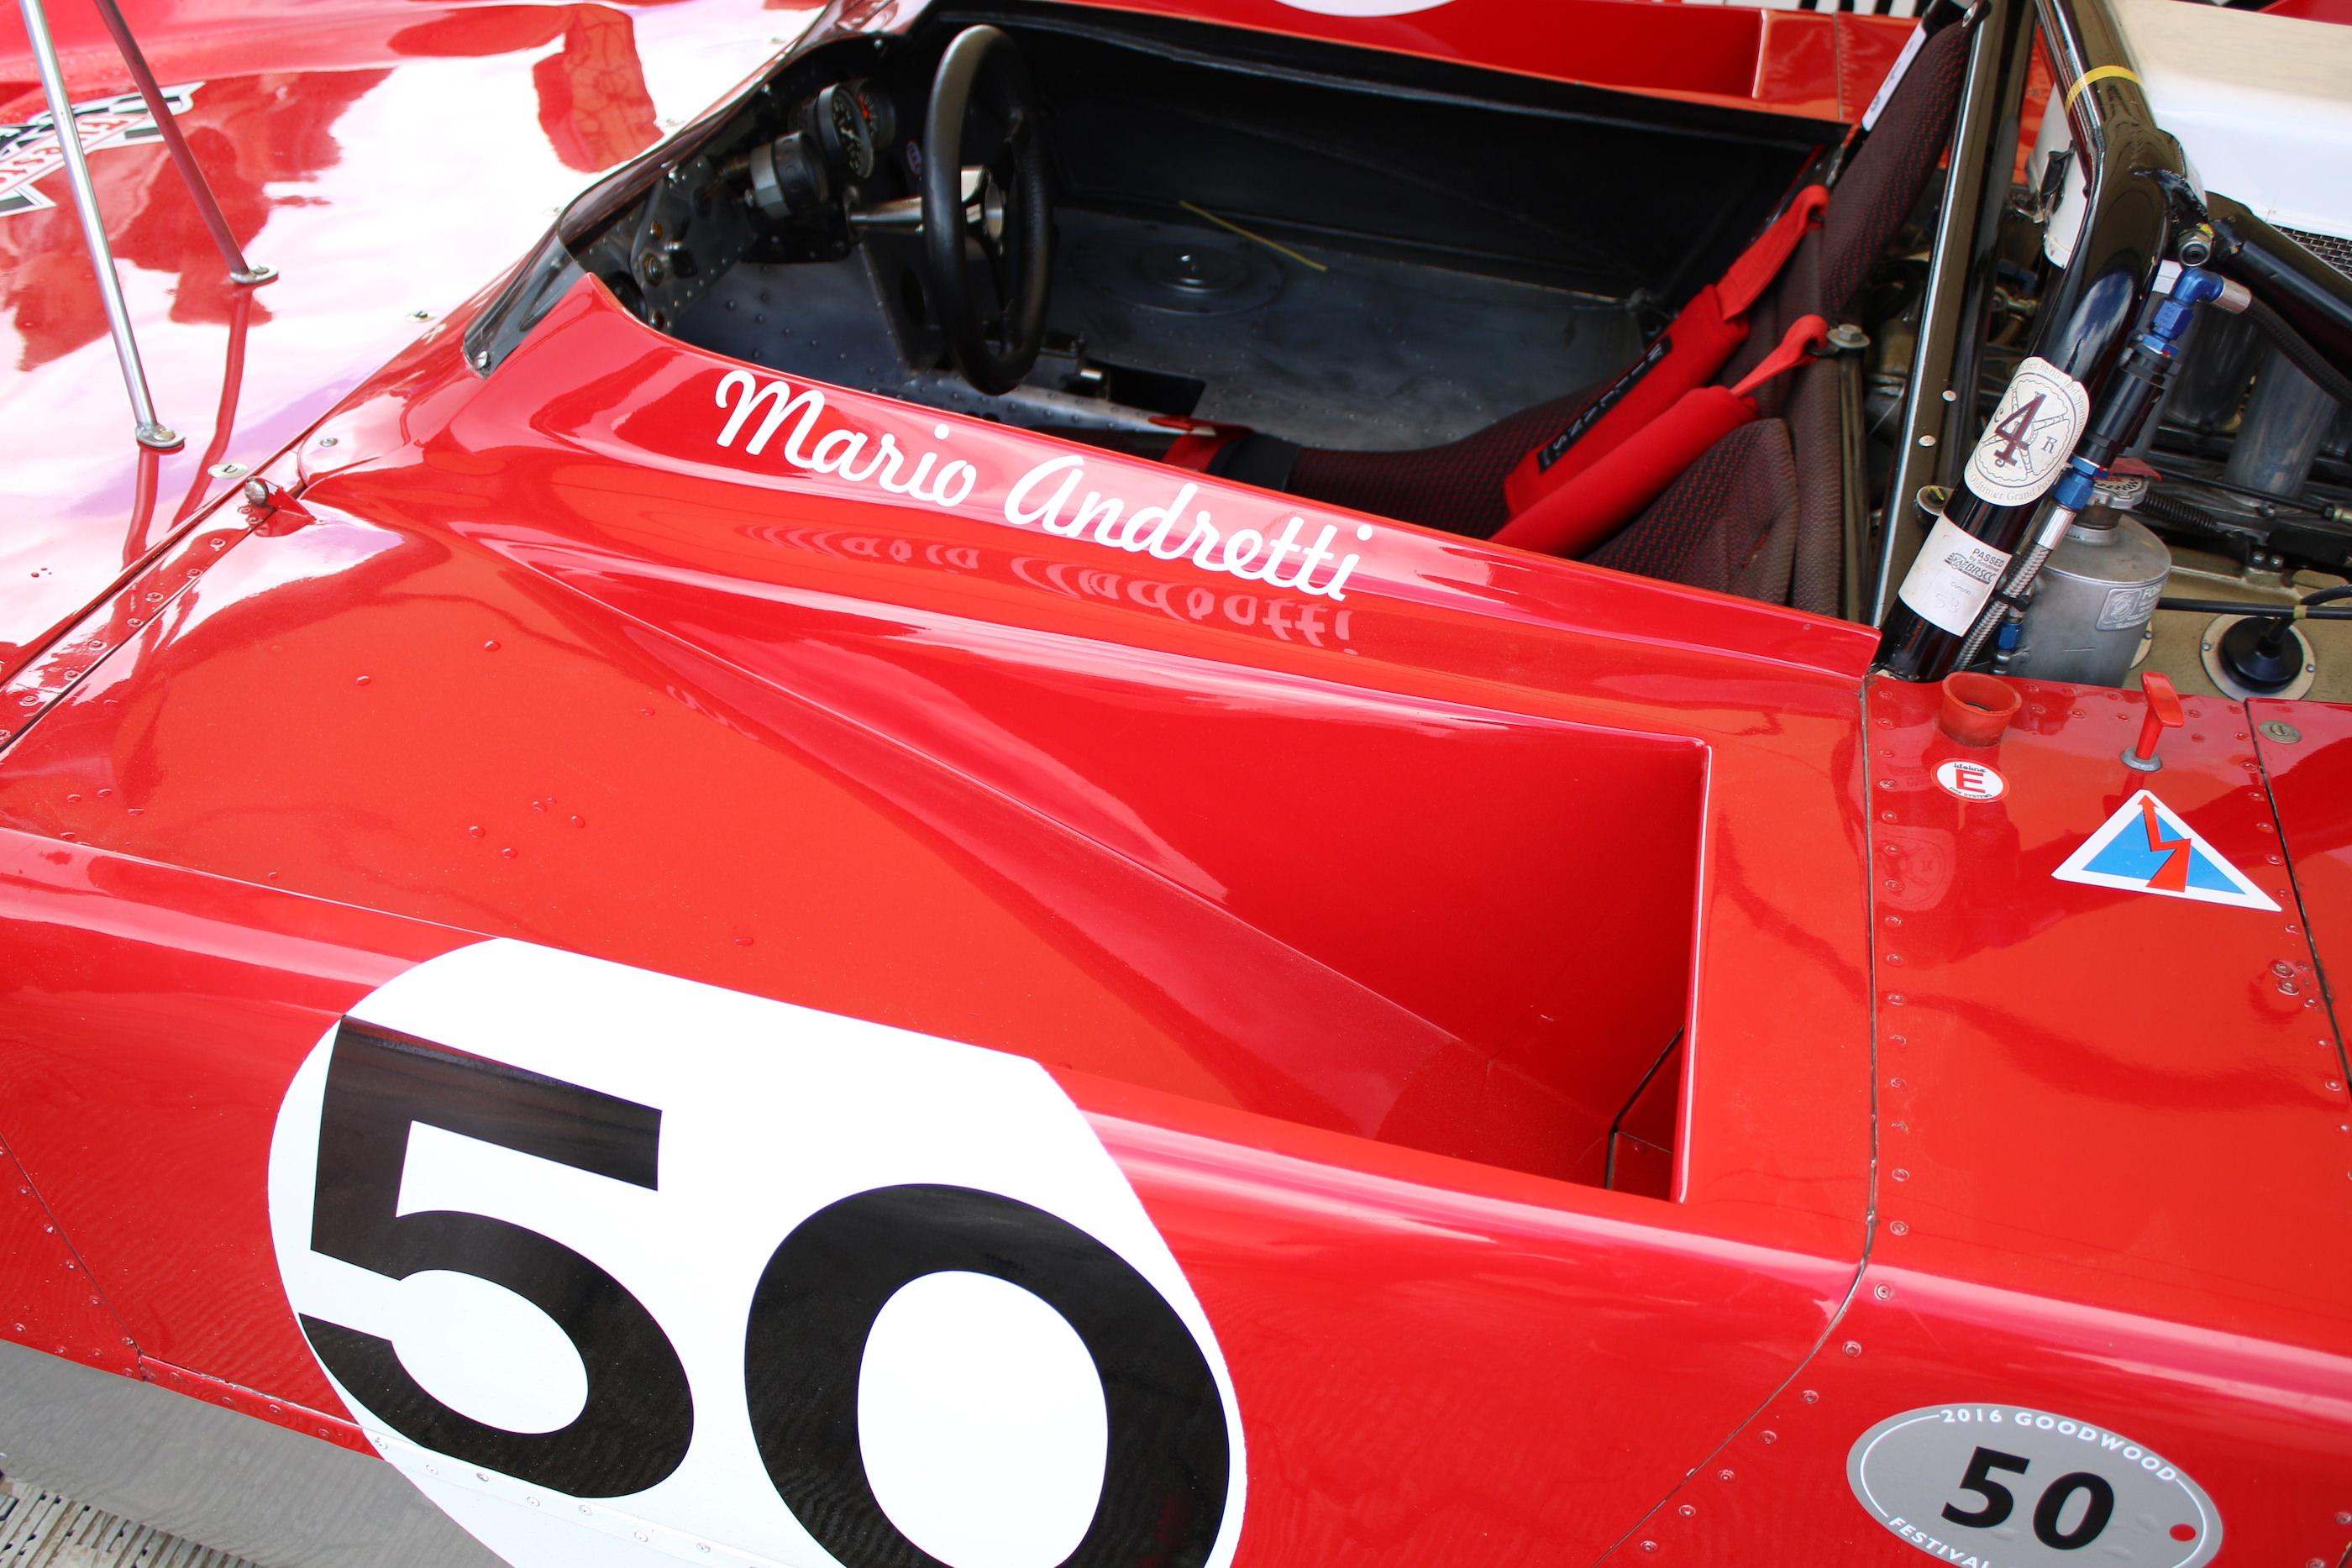 Ferrari gefahren von Mario Andretti